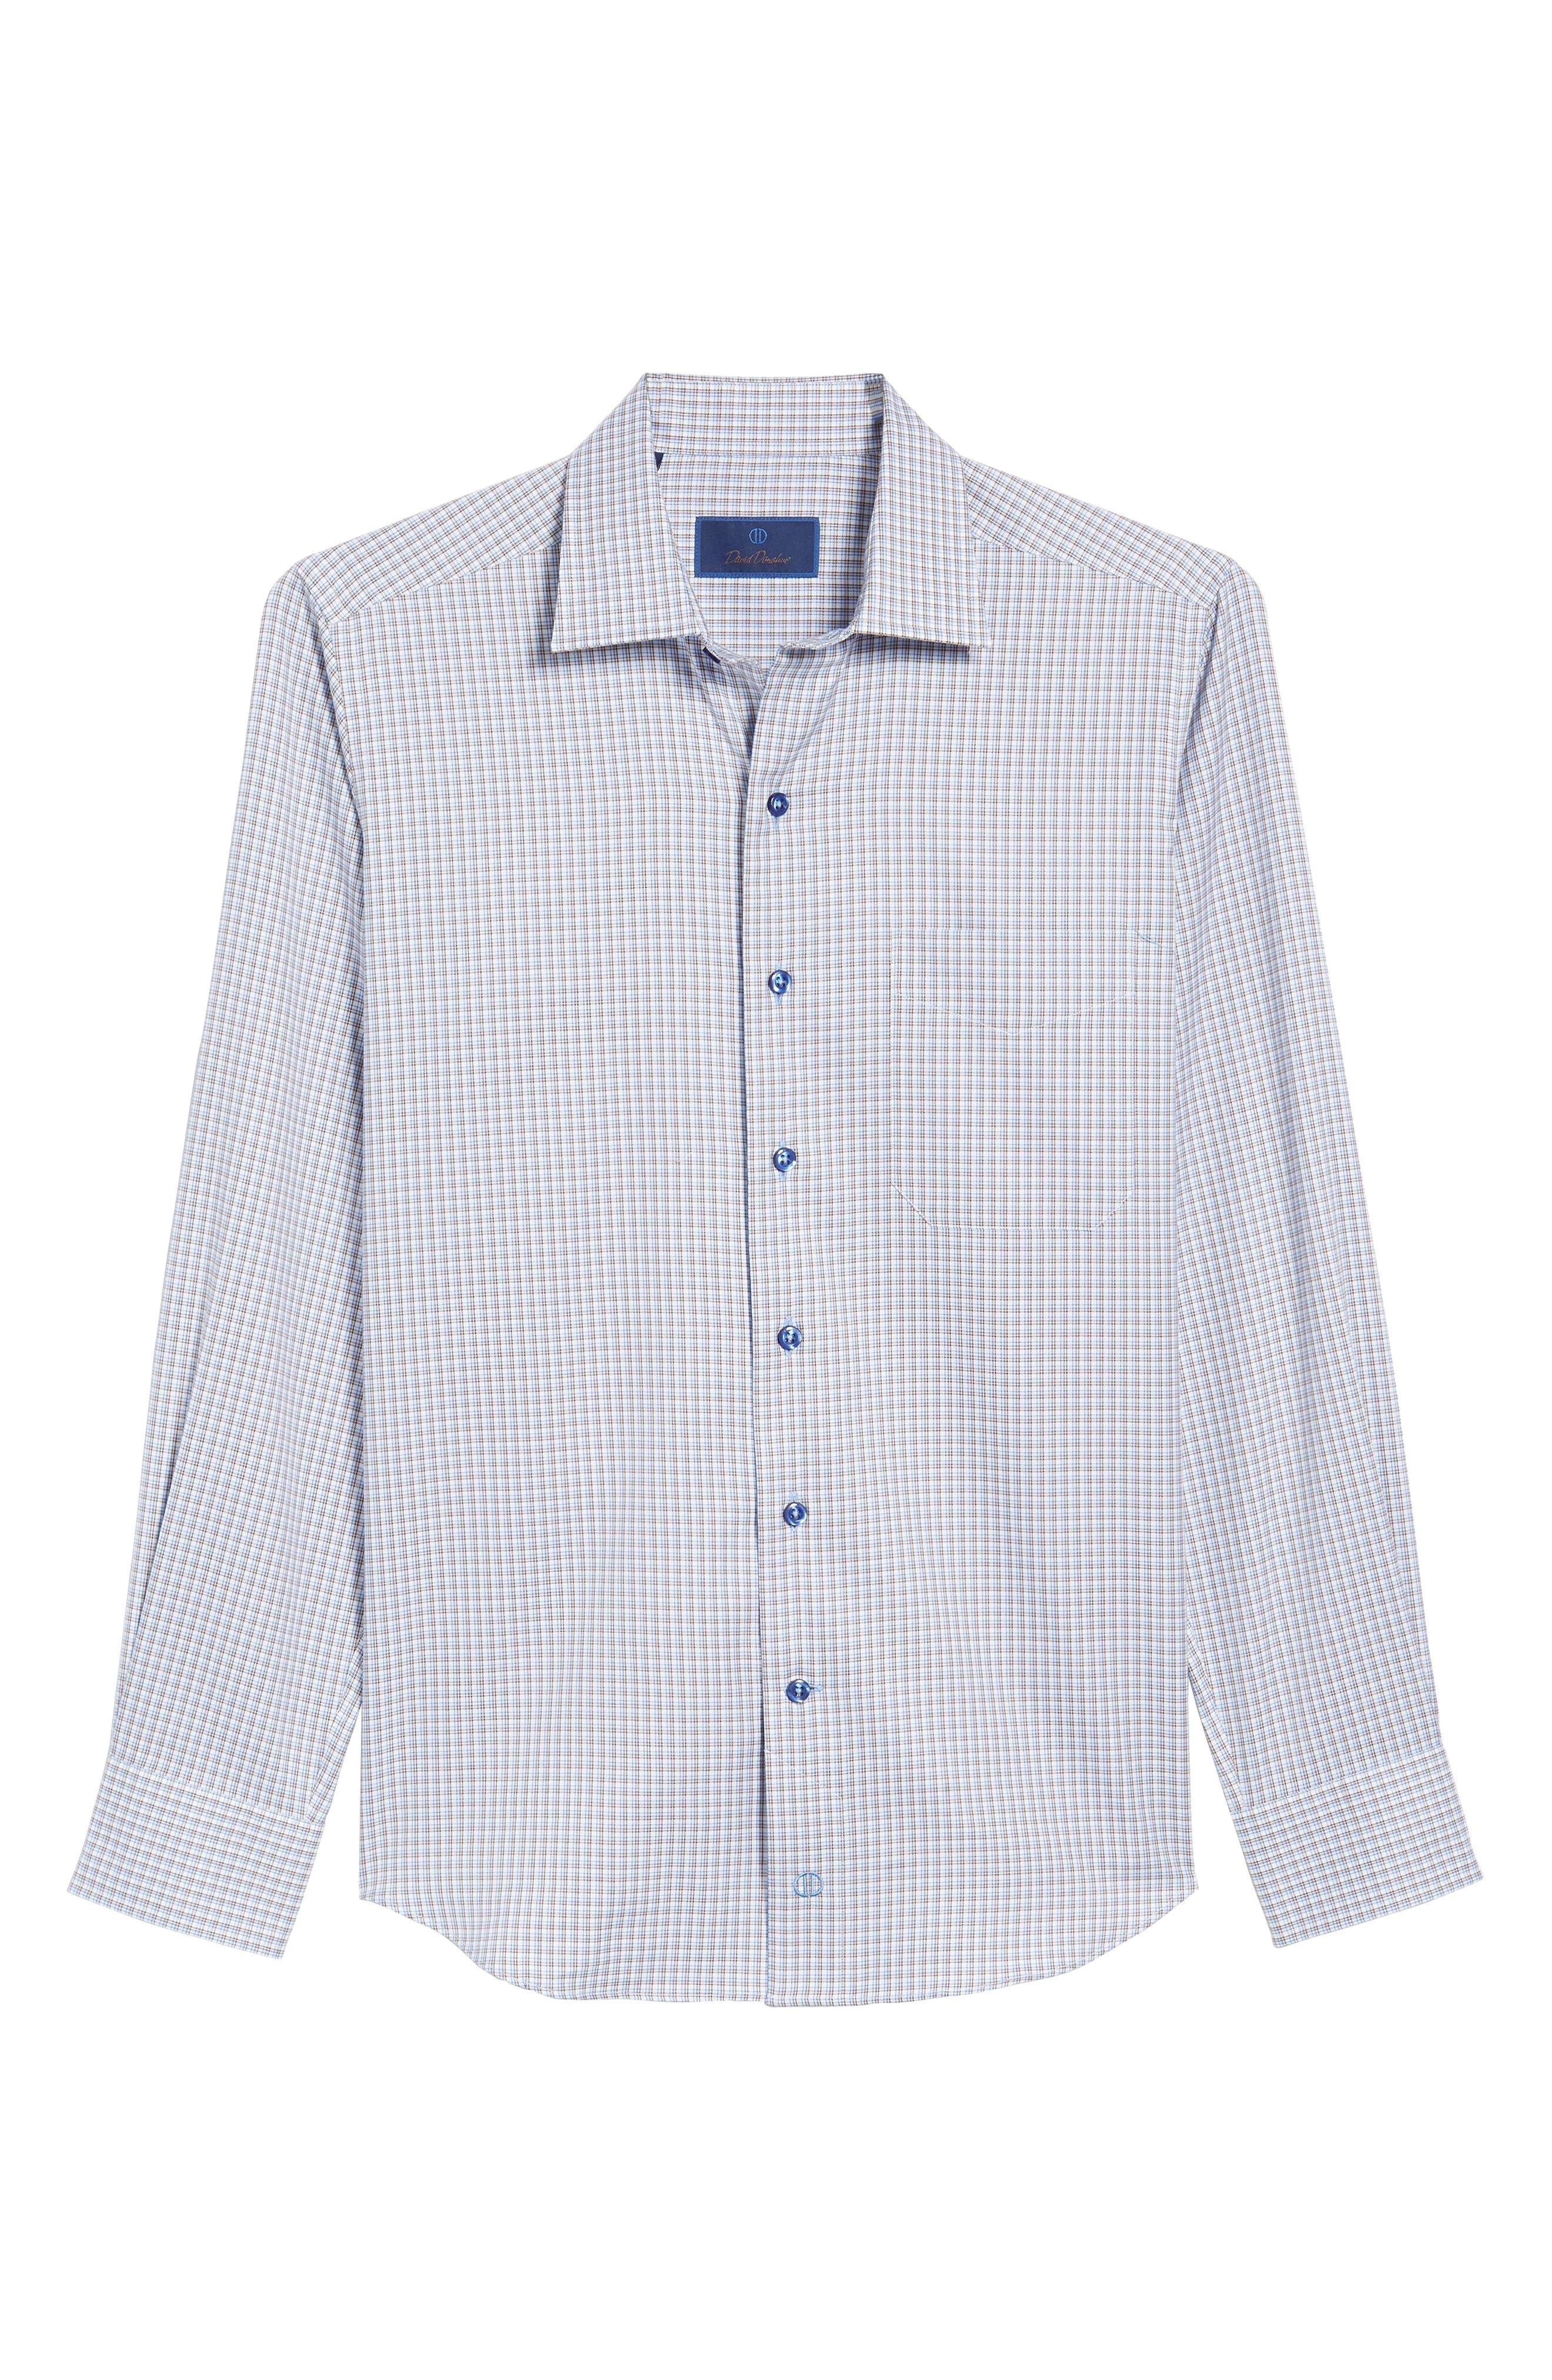 Sport Shirt,                             Alternate thumbnail 6, color,                             Blue/ Chocolate